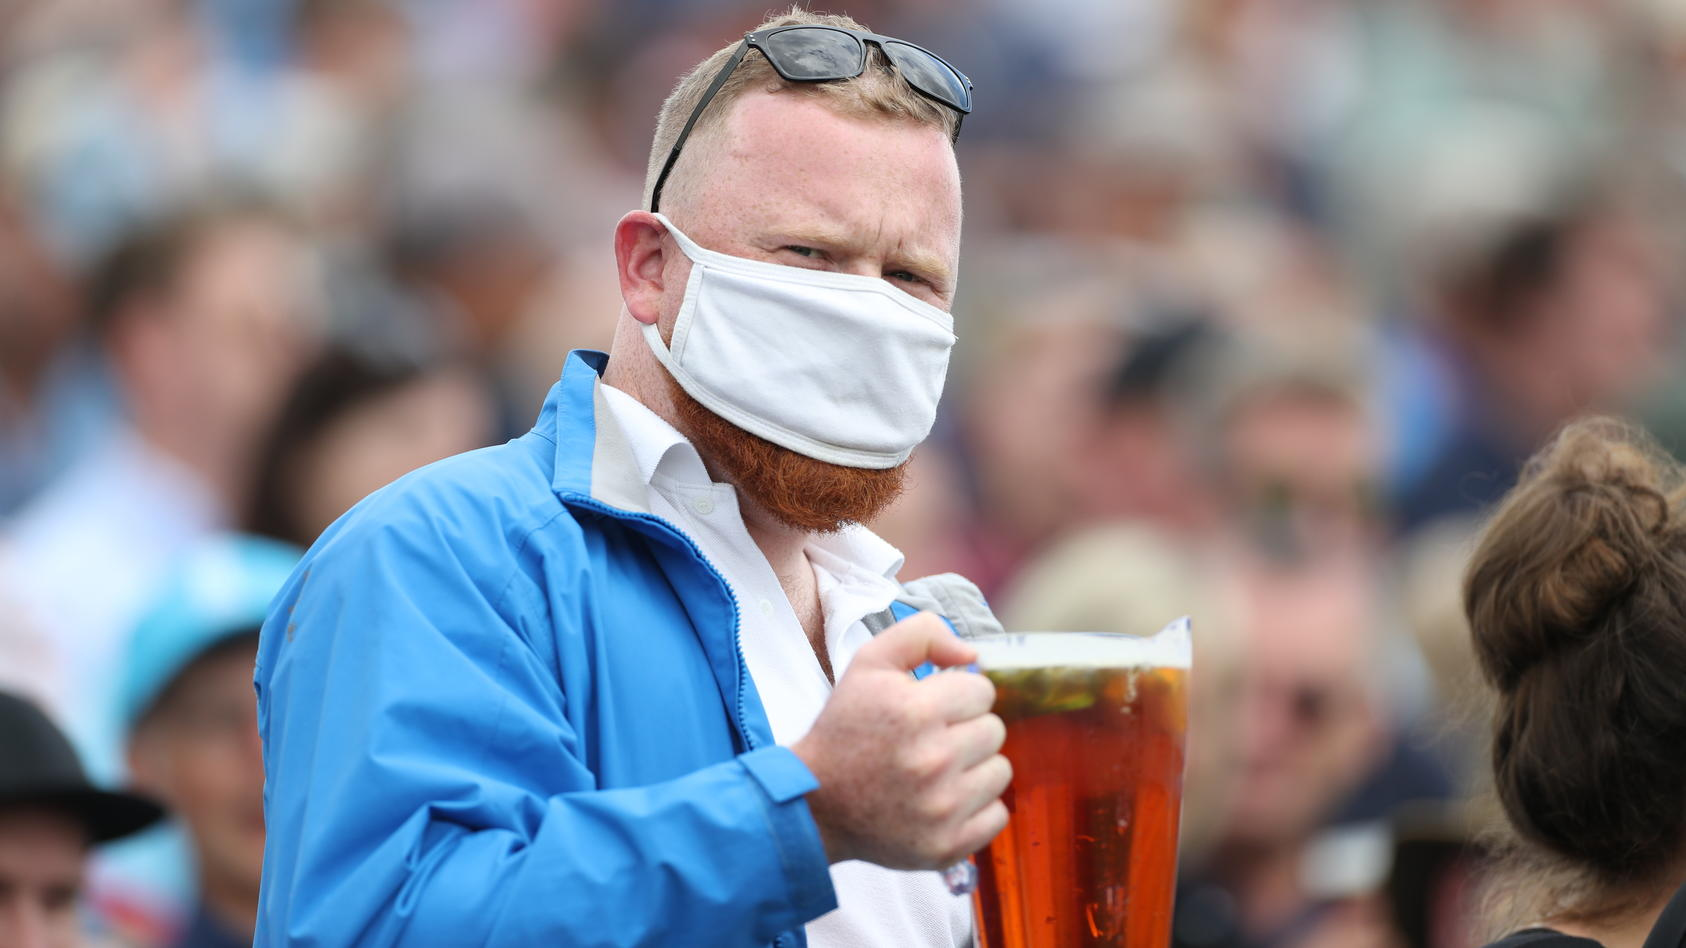 Fußball-Fan mit Bier.